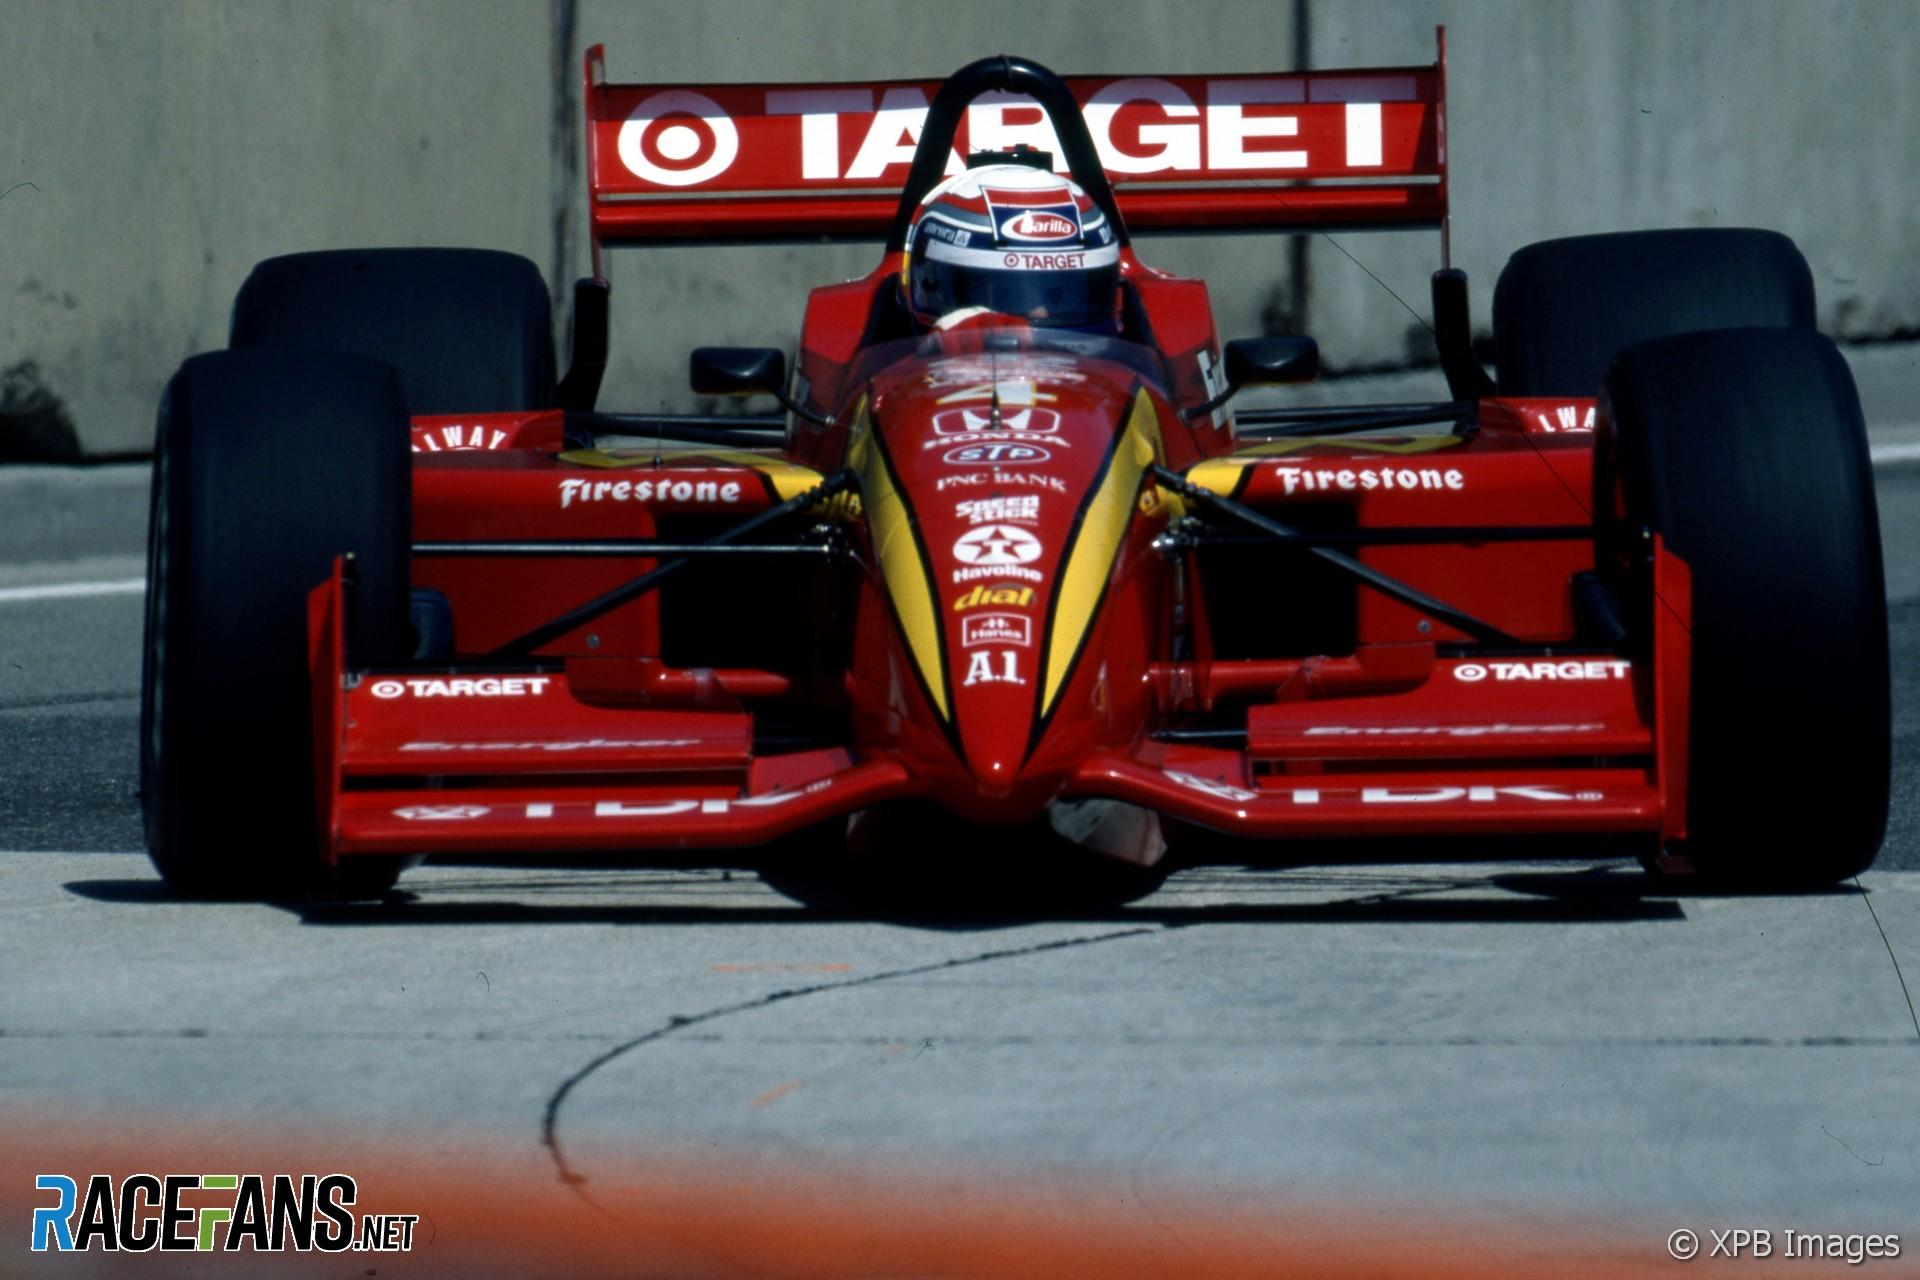 Alex Zanardi, Ganassi, IndyCar, Detroit, 1997